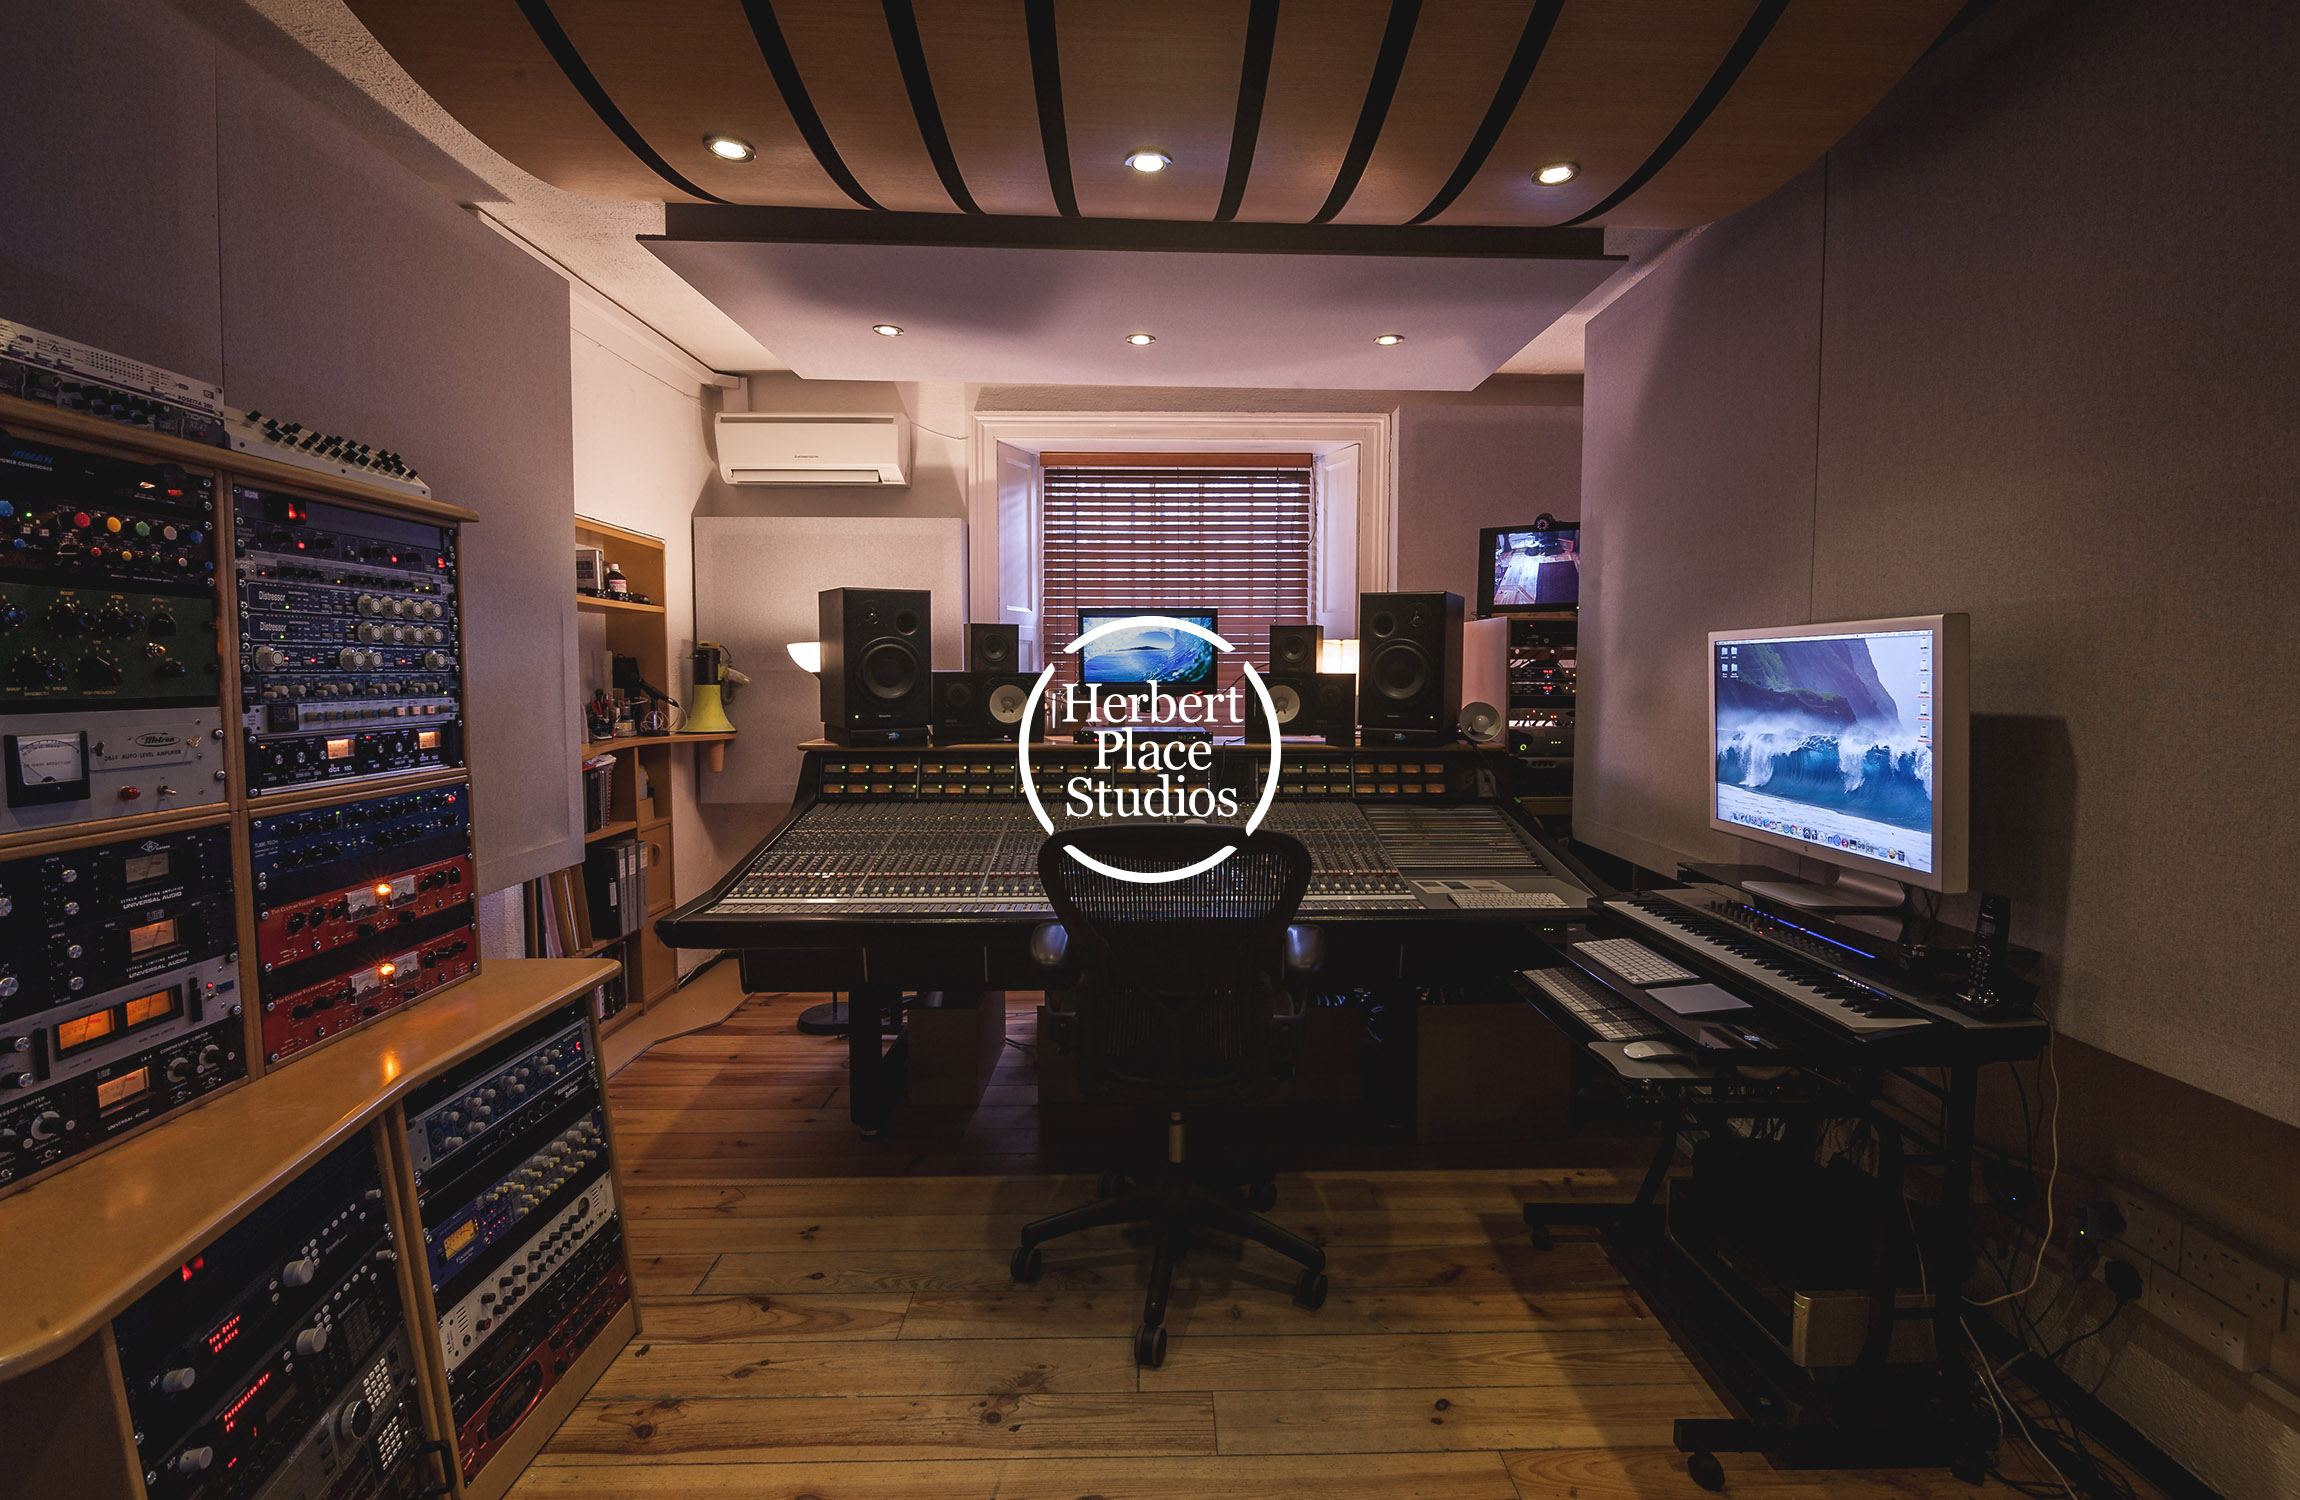 Herbert Place Studios Low Res- 01 copy